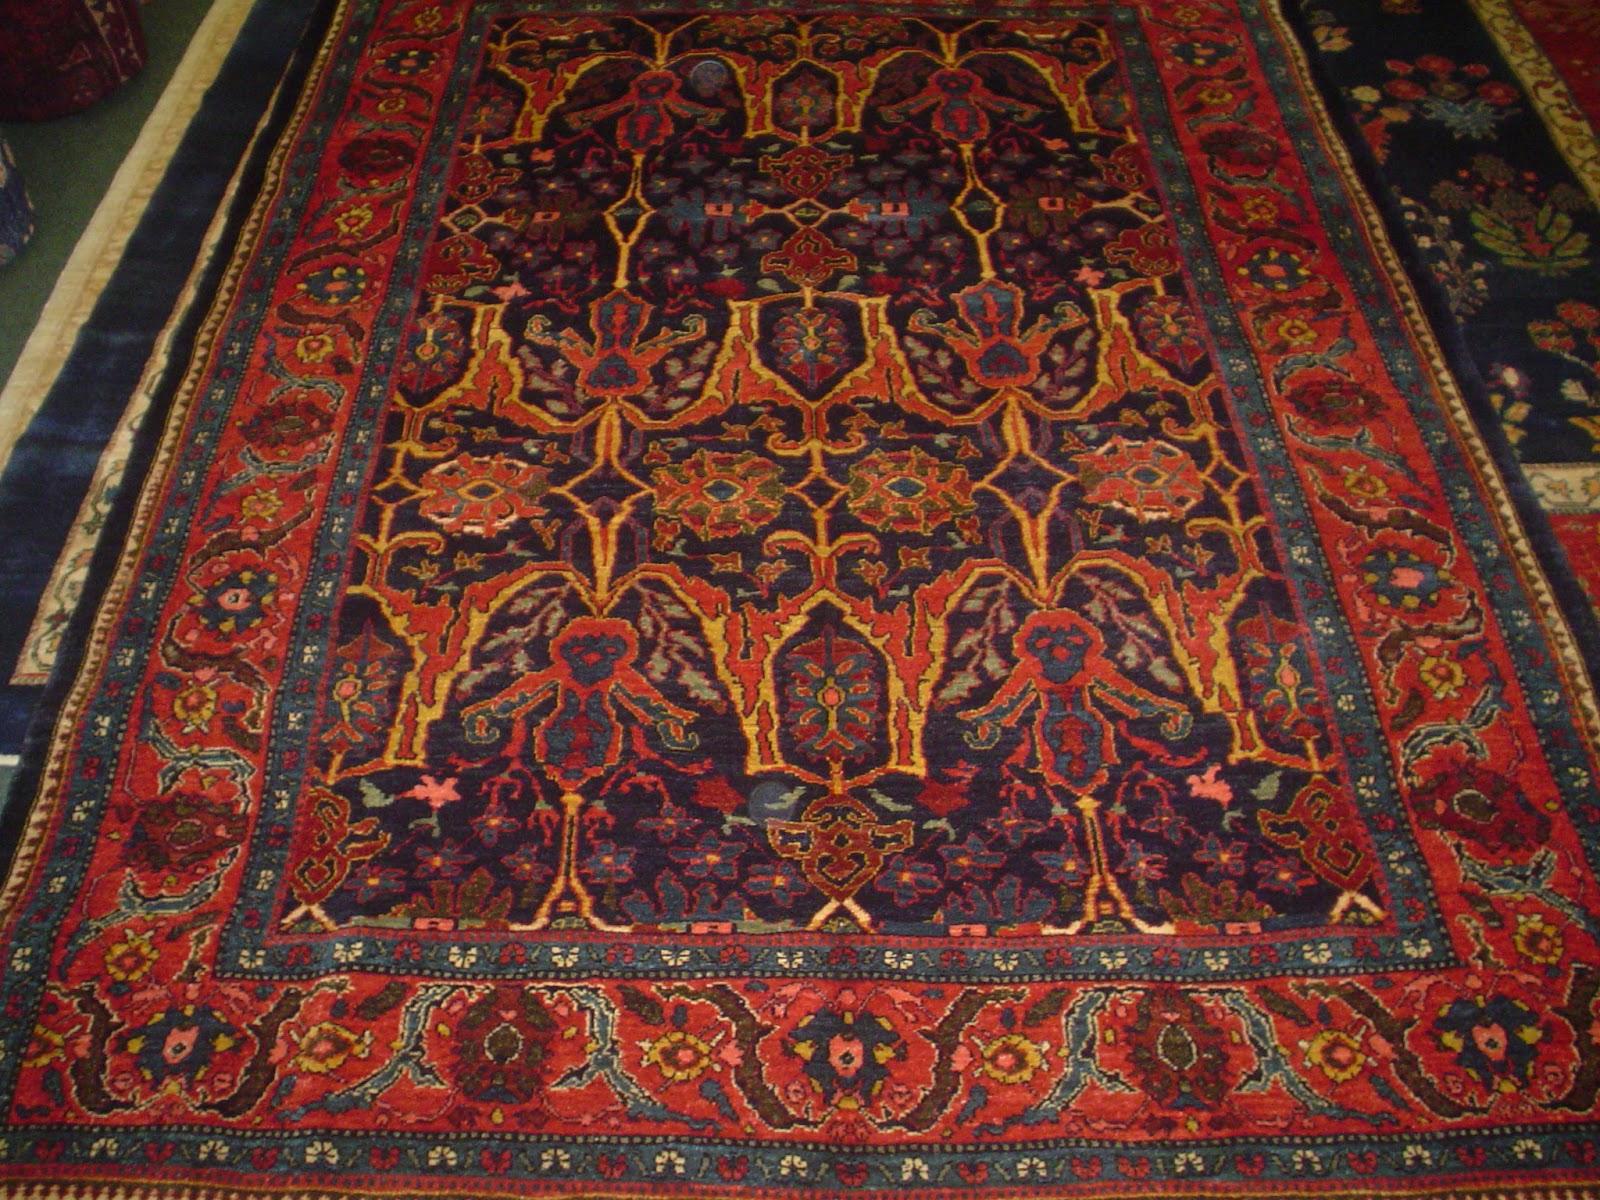 Photo: Persian Bijar rug in deeply saturated colors